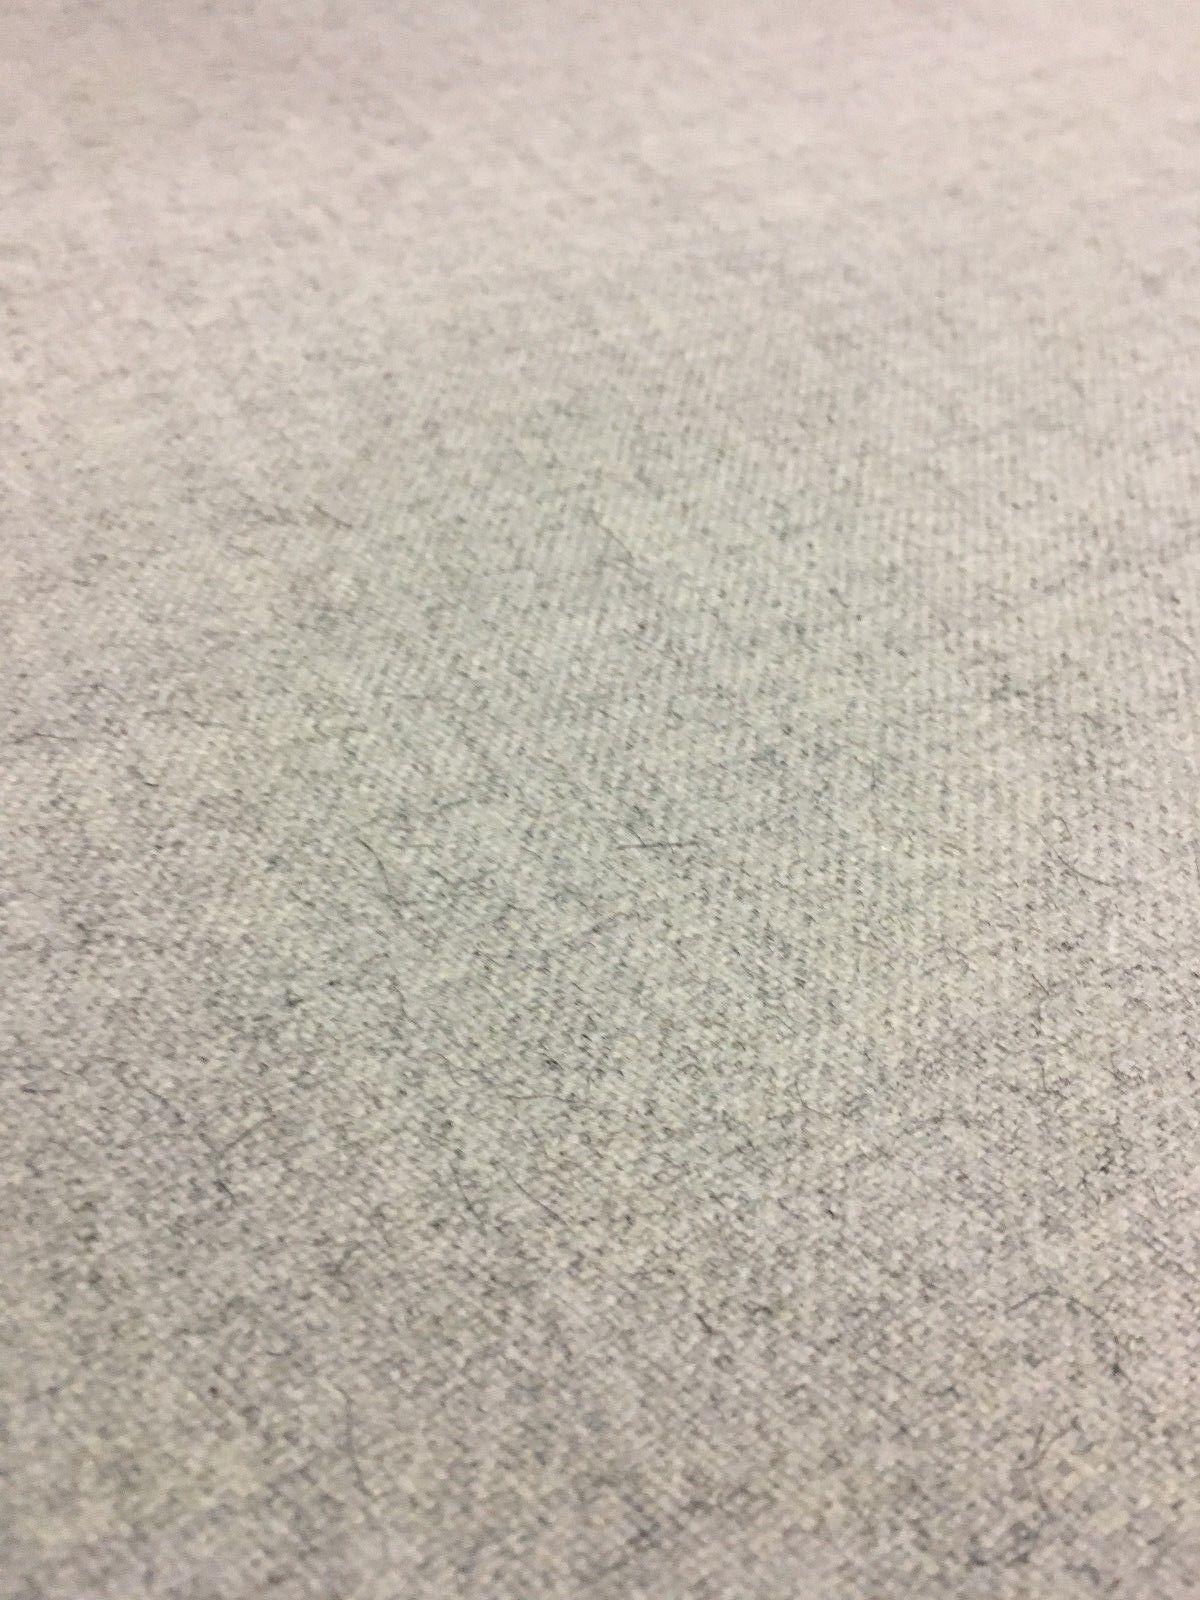 8.75 yds Woven Wool Upholstery Drapery Fabric MCM Gray Melange HL